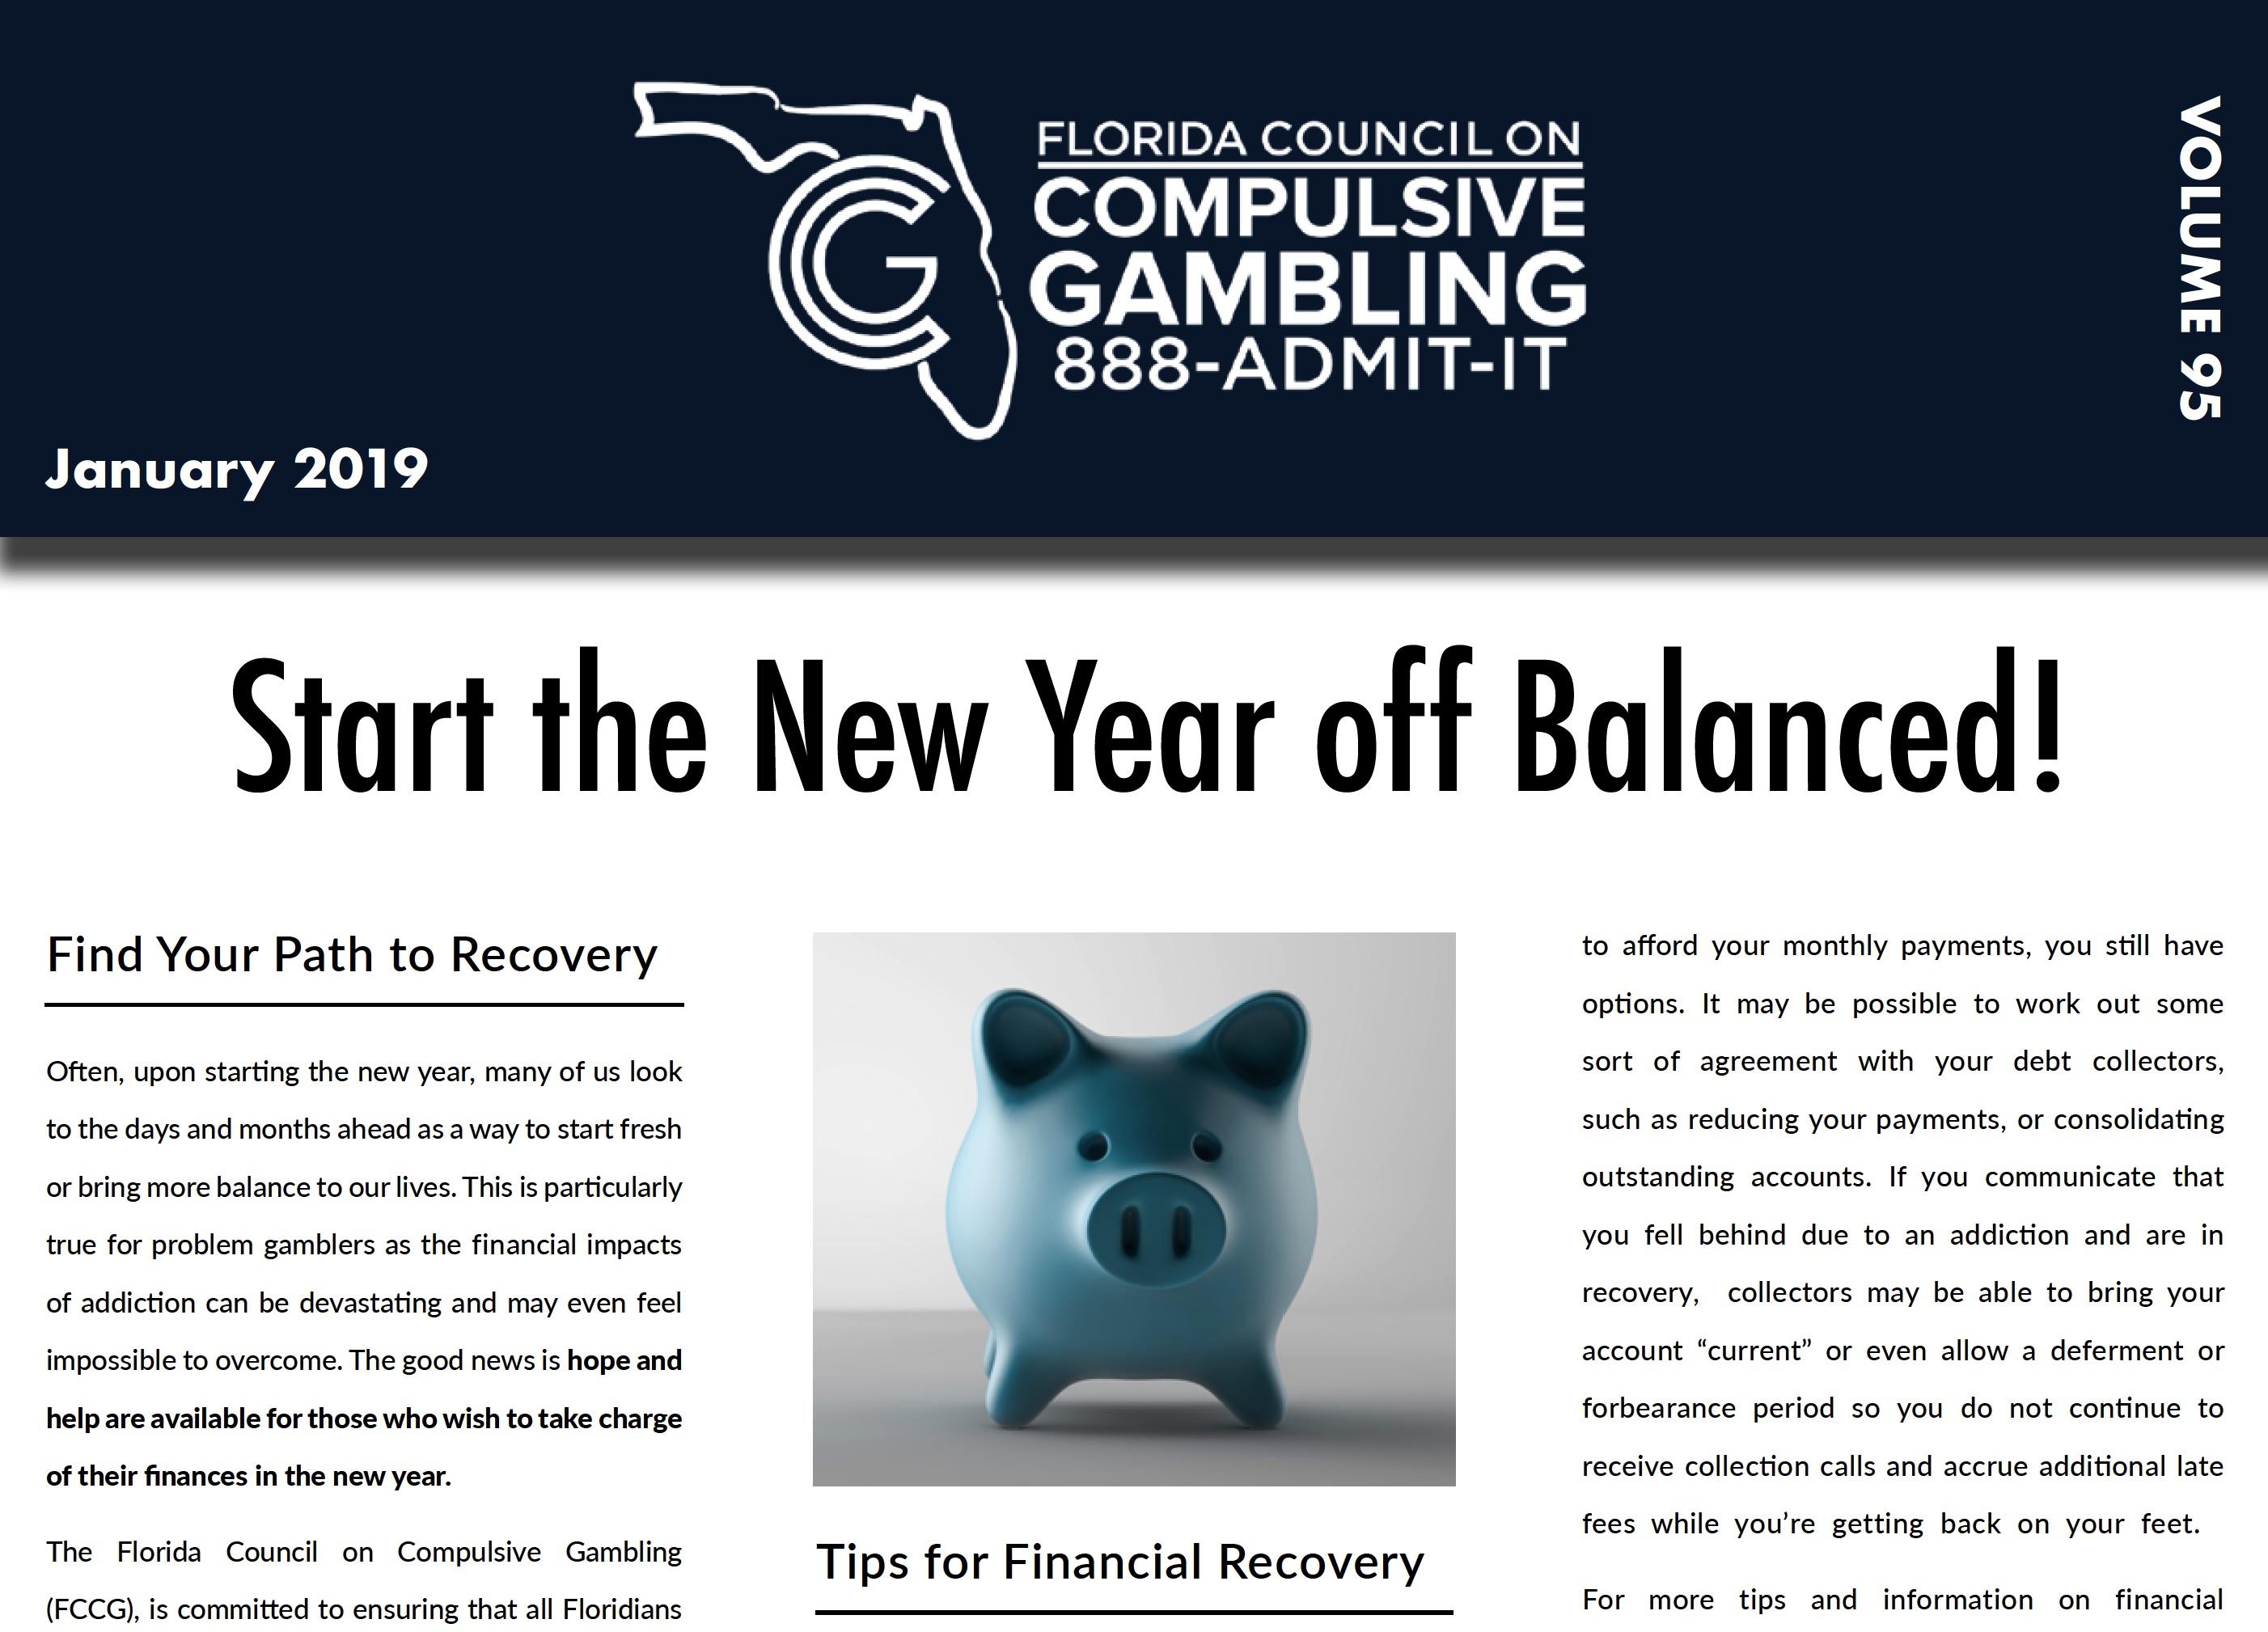 Compulsive gambling hotline online casino william hill